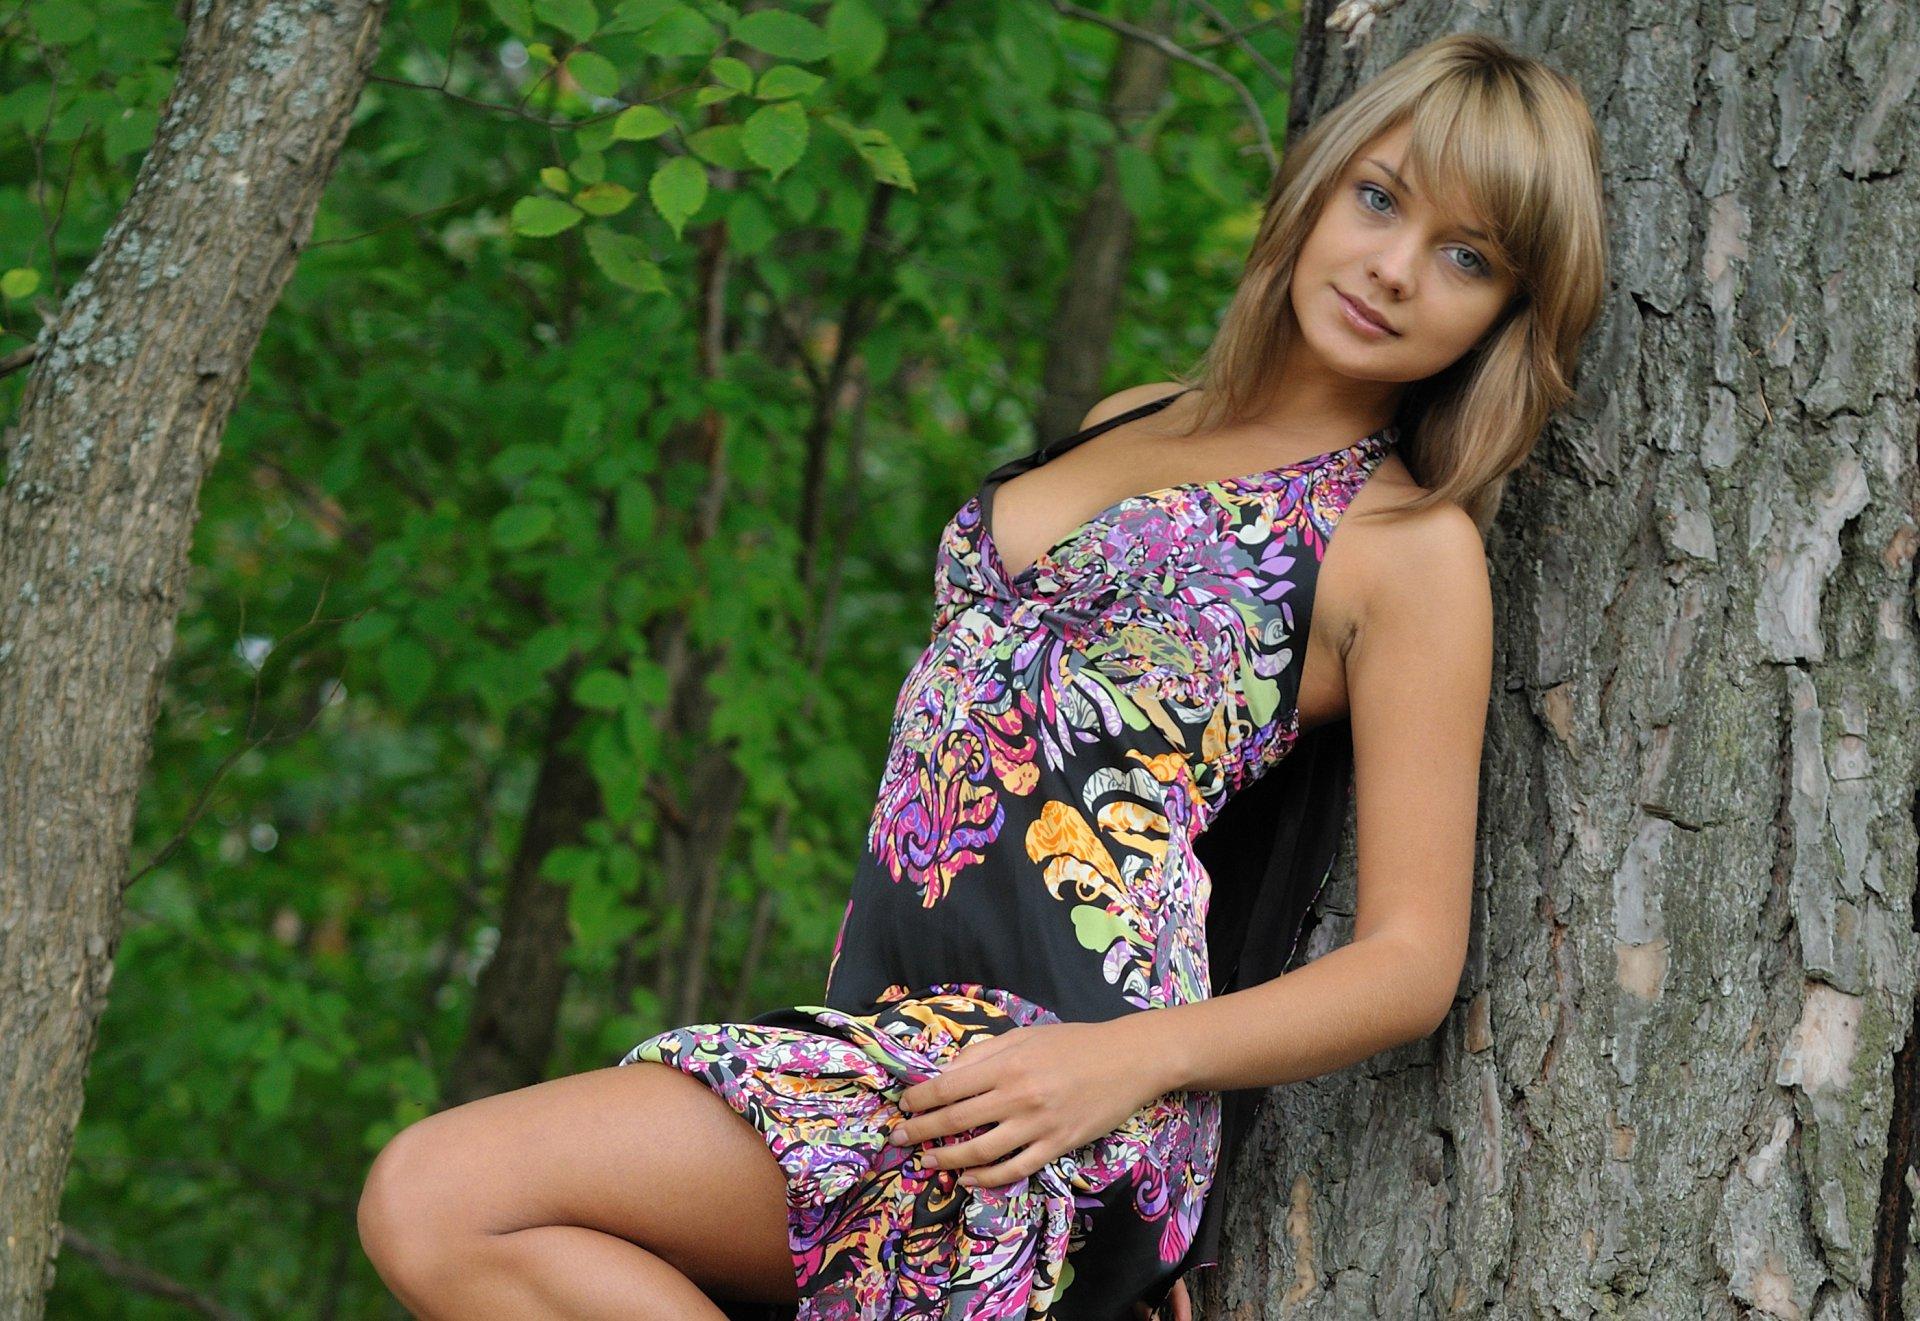 виновата том, блондинки в сарафанах частное фото инцест